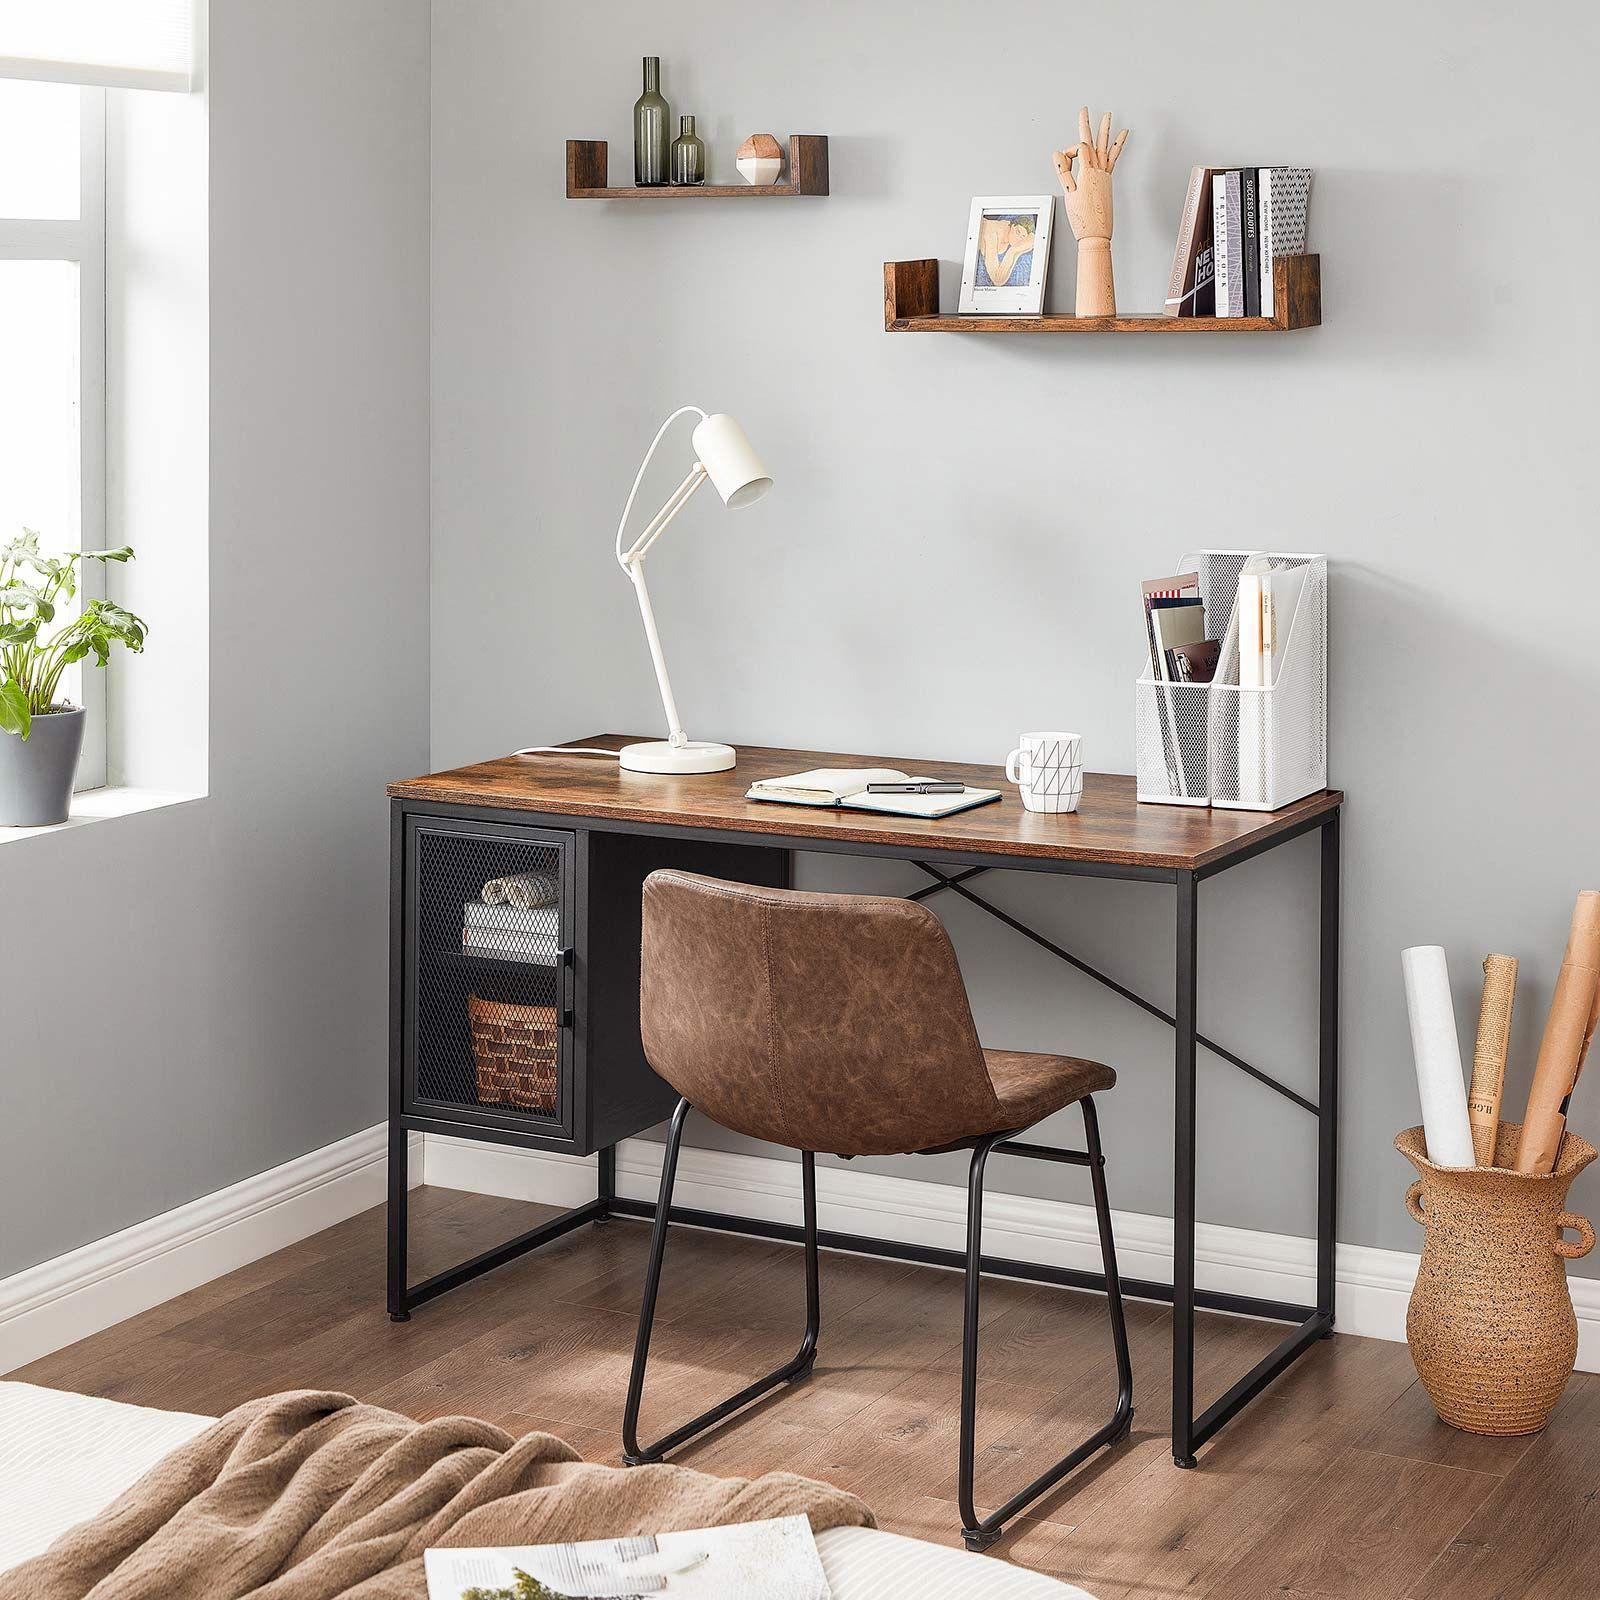 Computer Desk With Adjustable Shelf In 2021 Desk In Living Room Desks For Small Spaces Home Desk Small desk for living room